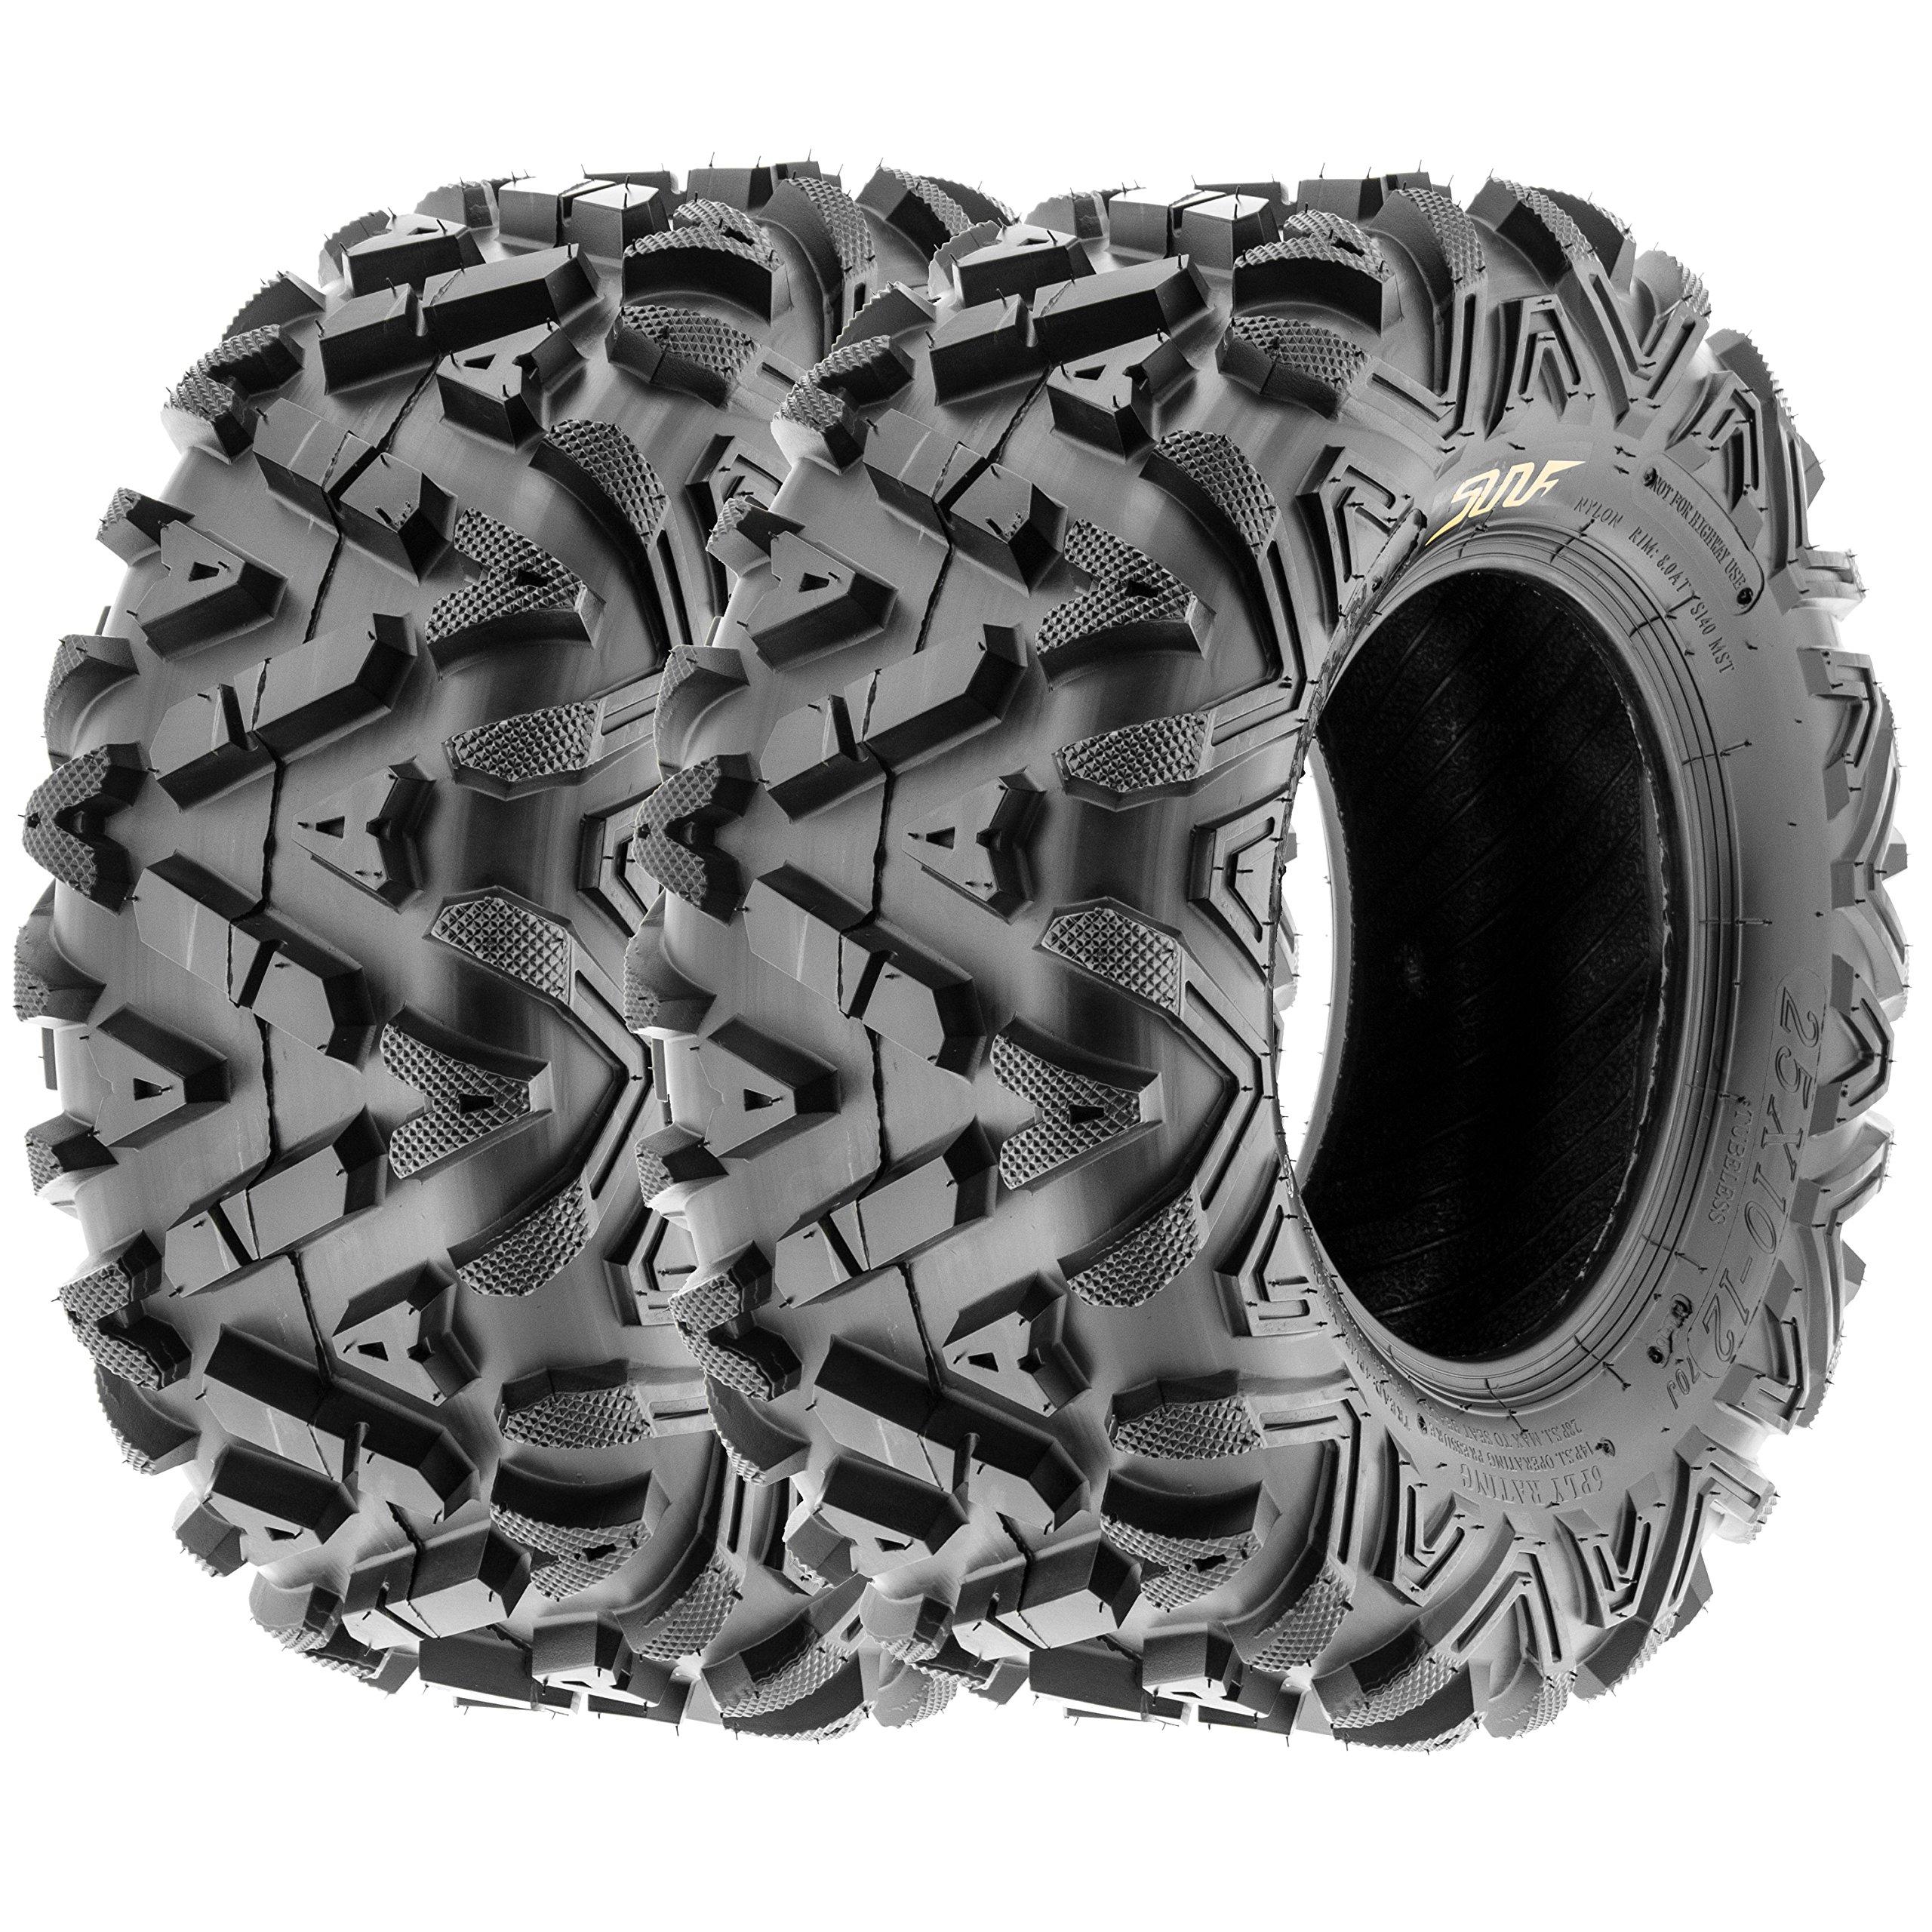 SunF All Trail A/T ATV UTV Tires 22x10-12 22x10x12 6 PR A033 (Set pair of 2)